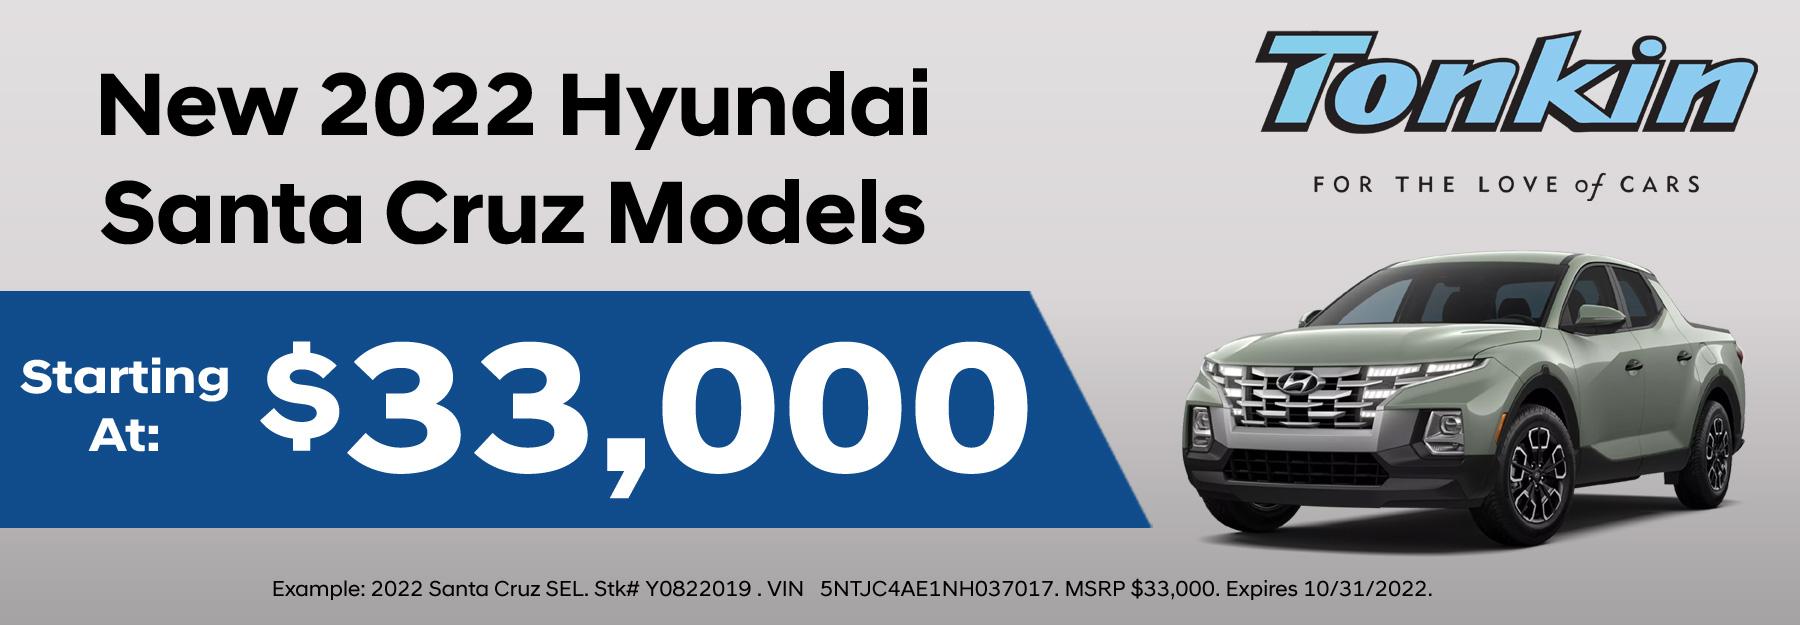 Hyundai Santa Cruz Retail Special